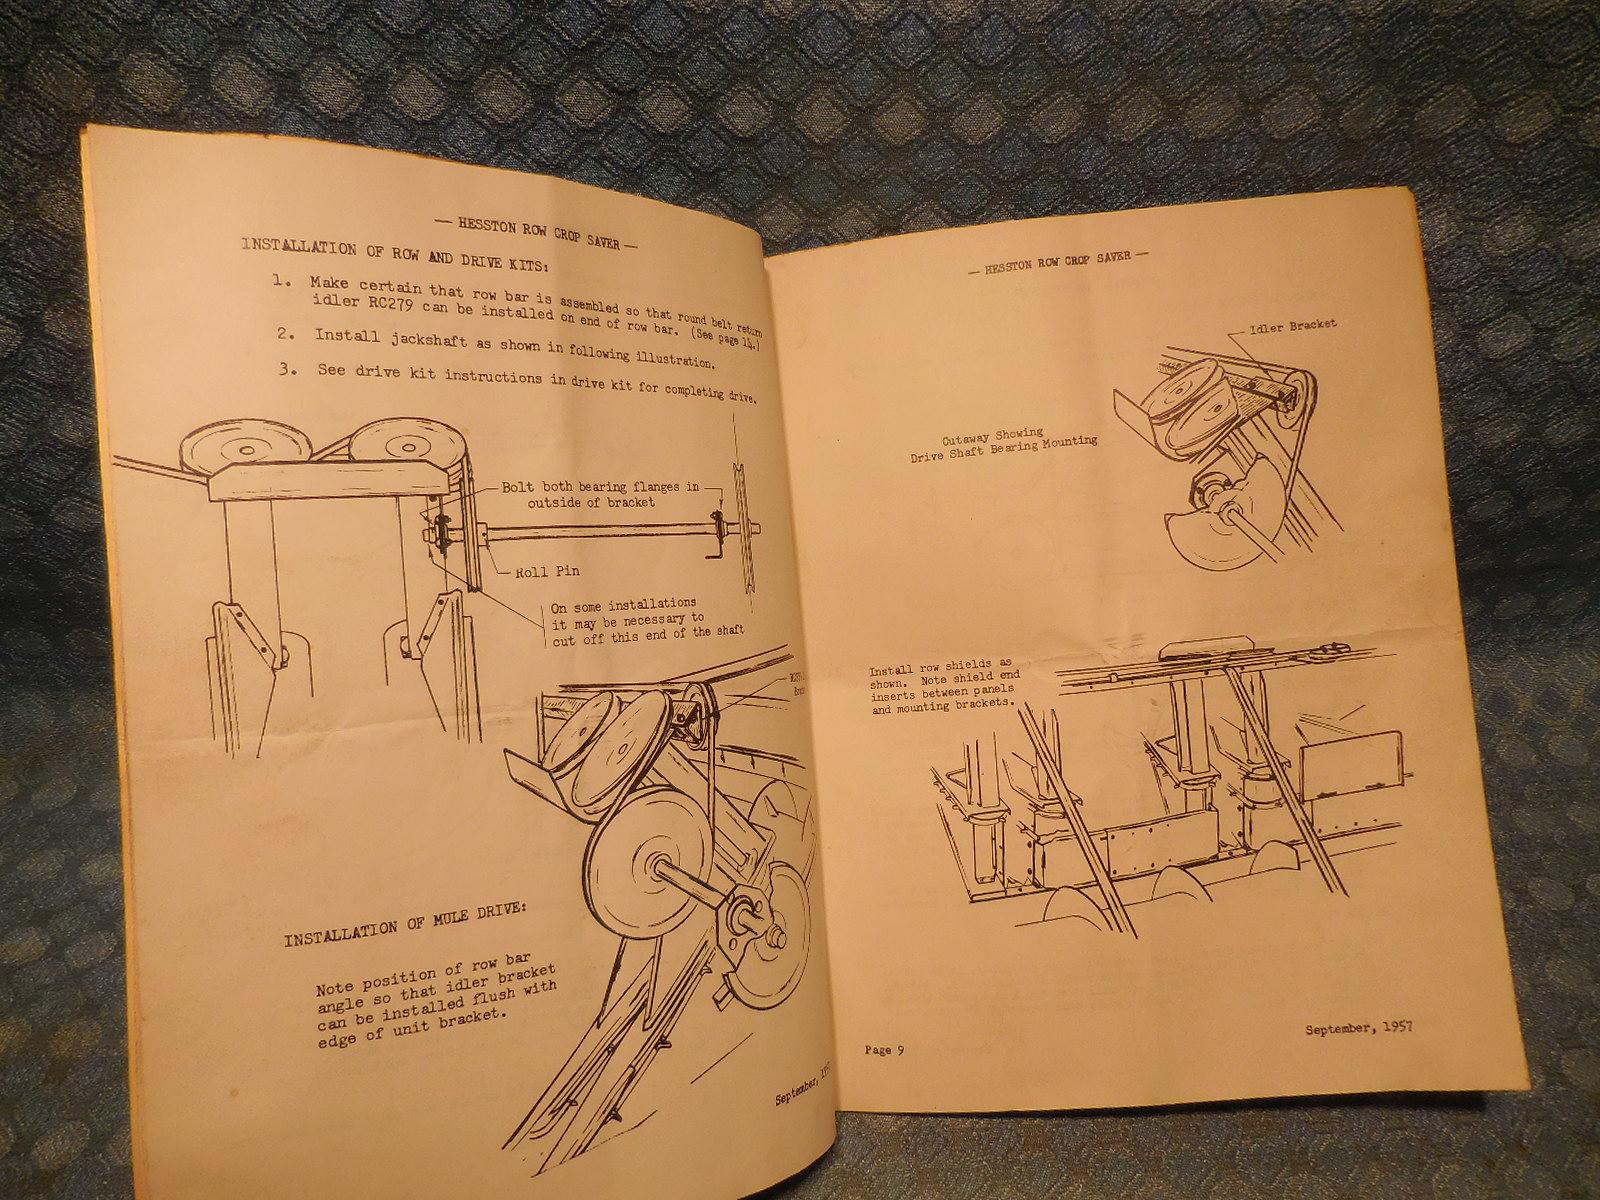 Hesston Wiring Diagram Library Maserati Tc Fuse Box Location 1957 Row Crop Saver Original Owners Manual